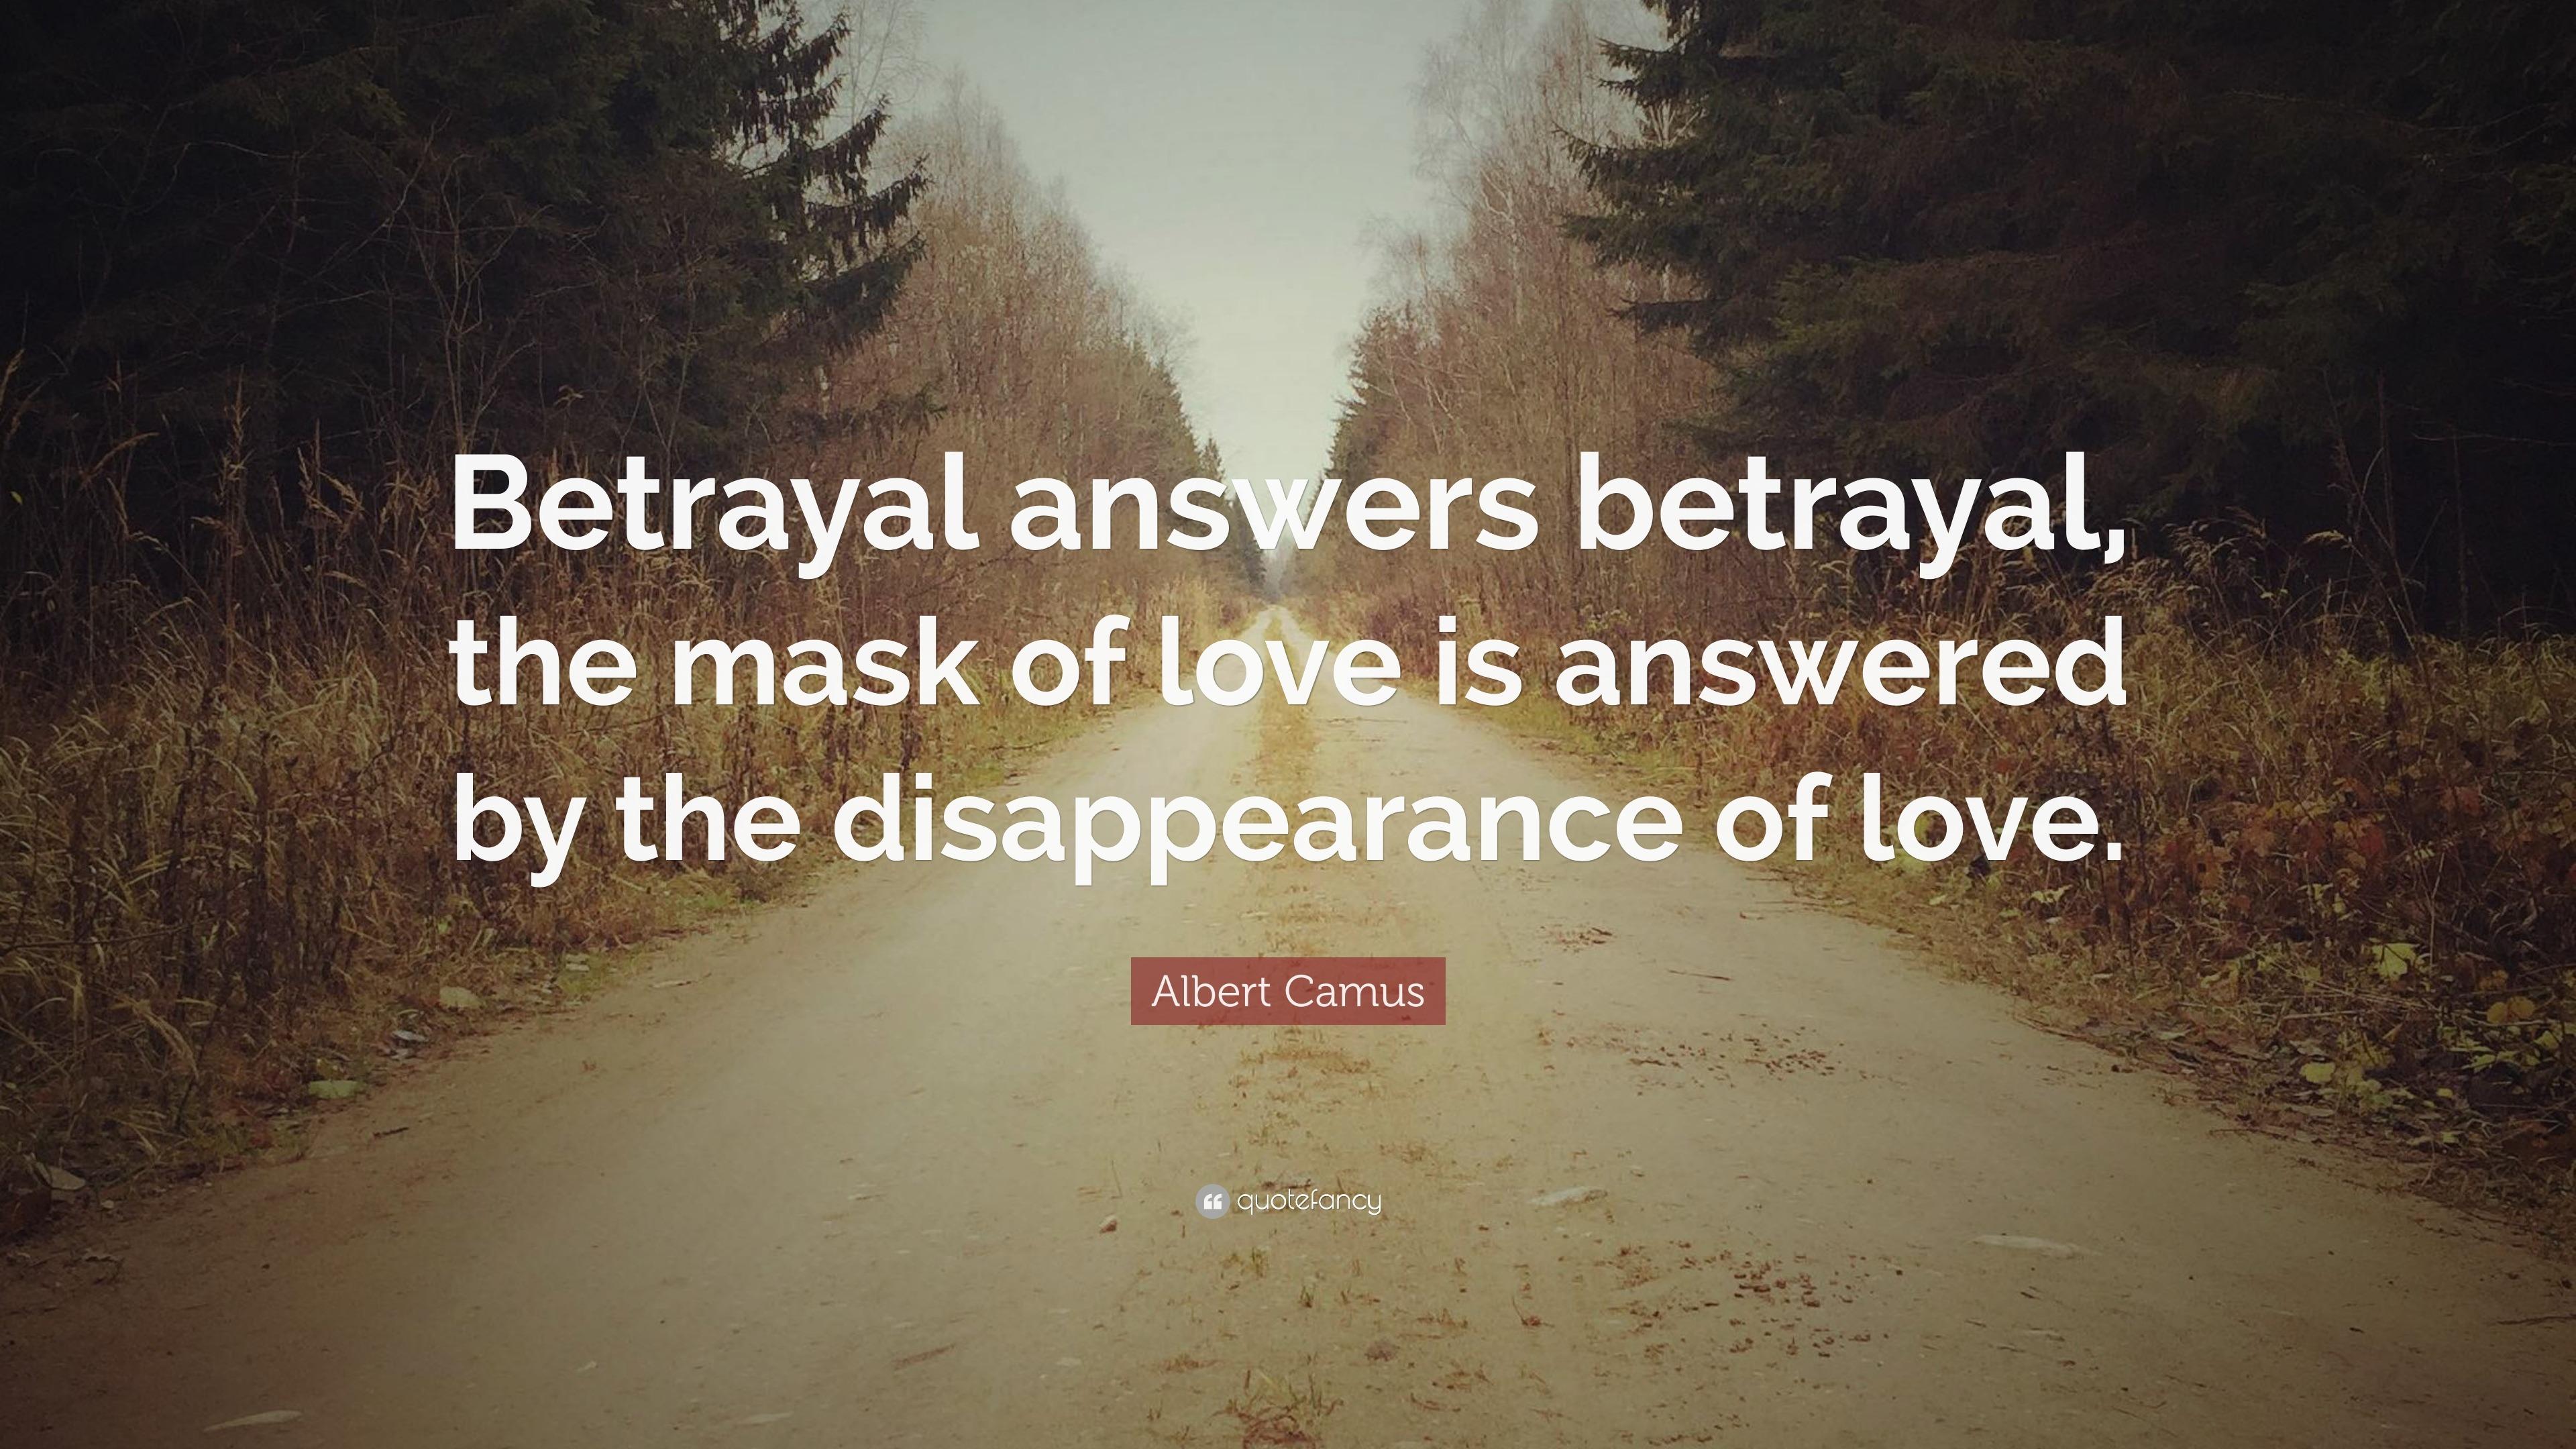 Albert Camus Quote: Betrayal answers betrayal, the mask